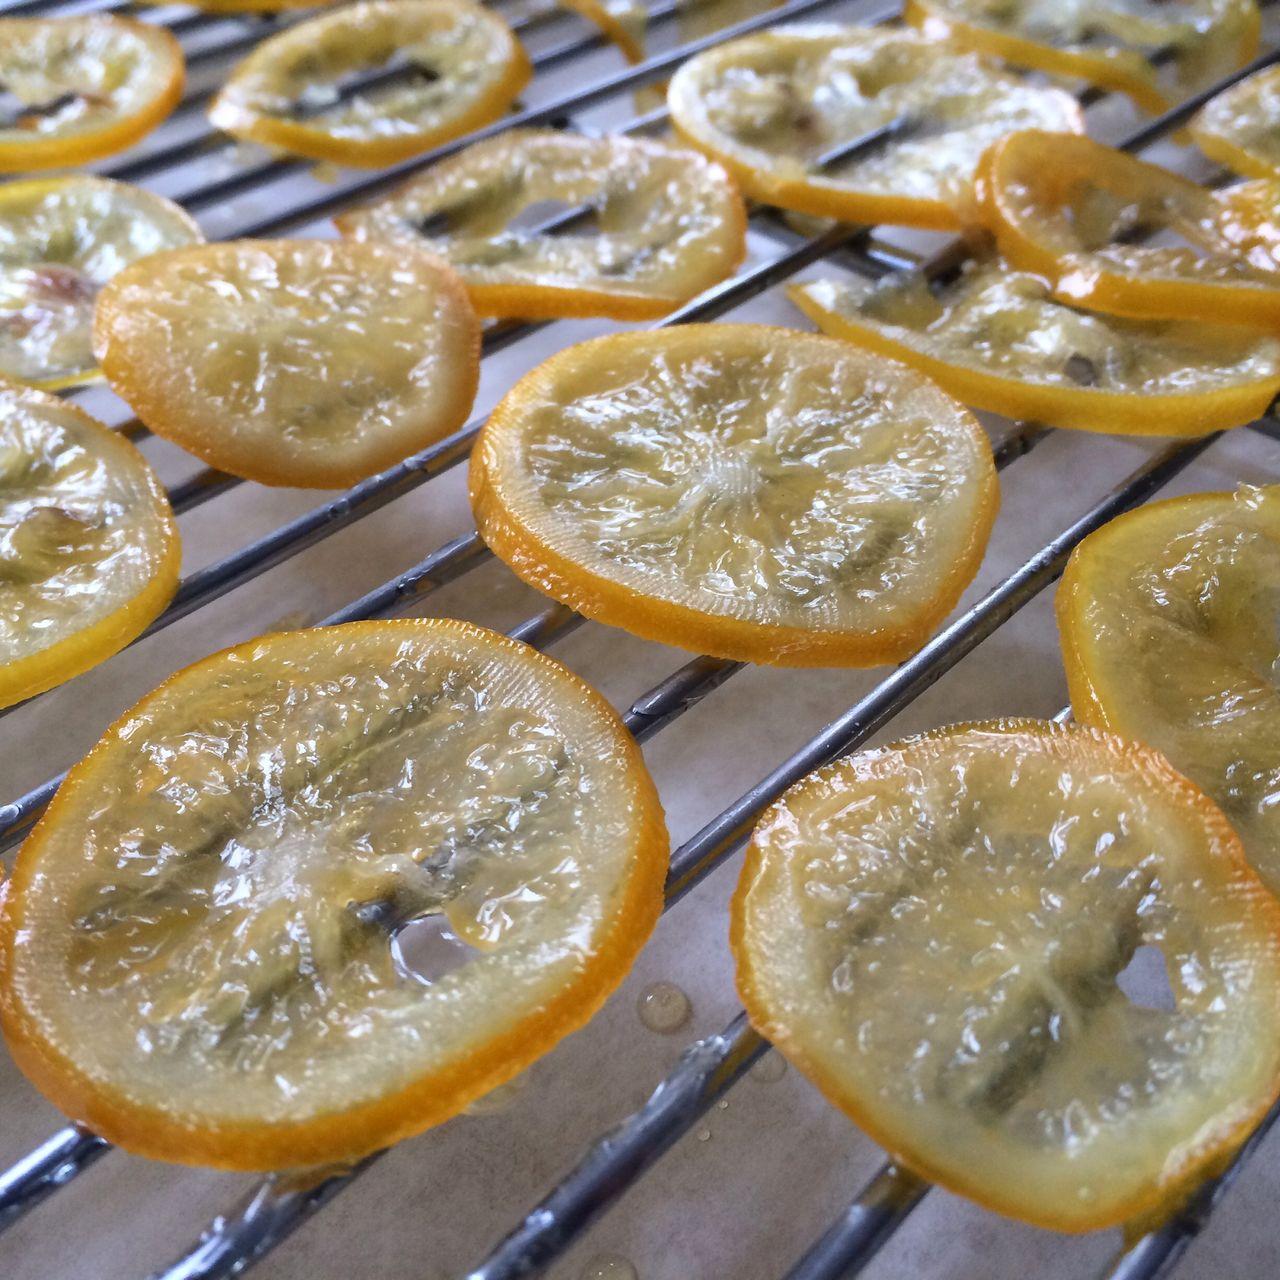 Dessert of lemon slices on metal grate